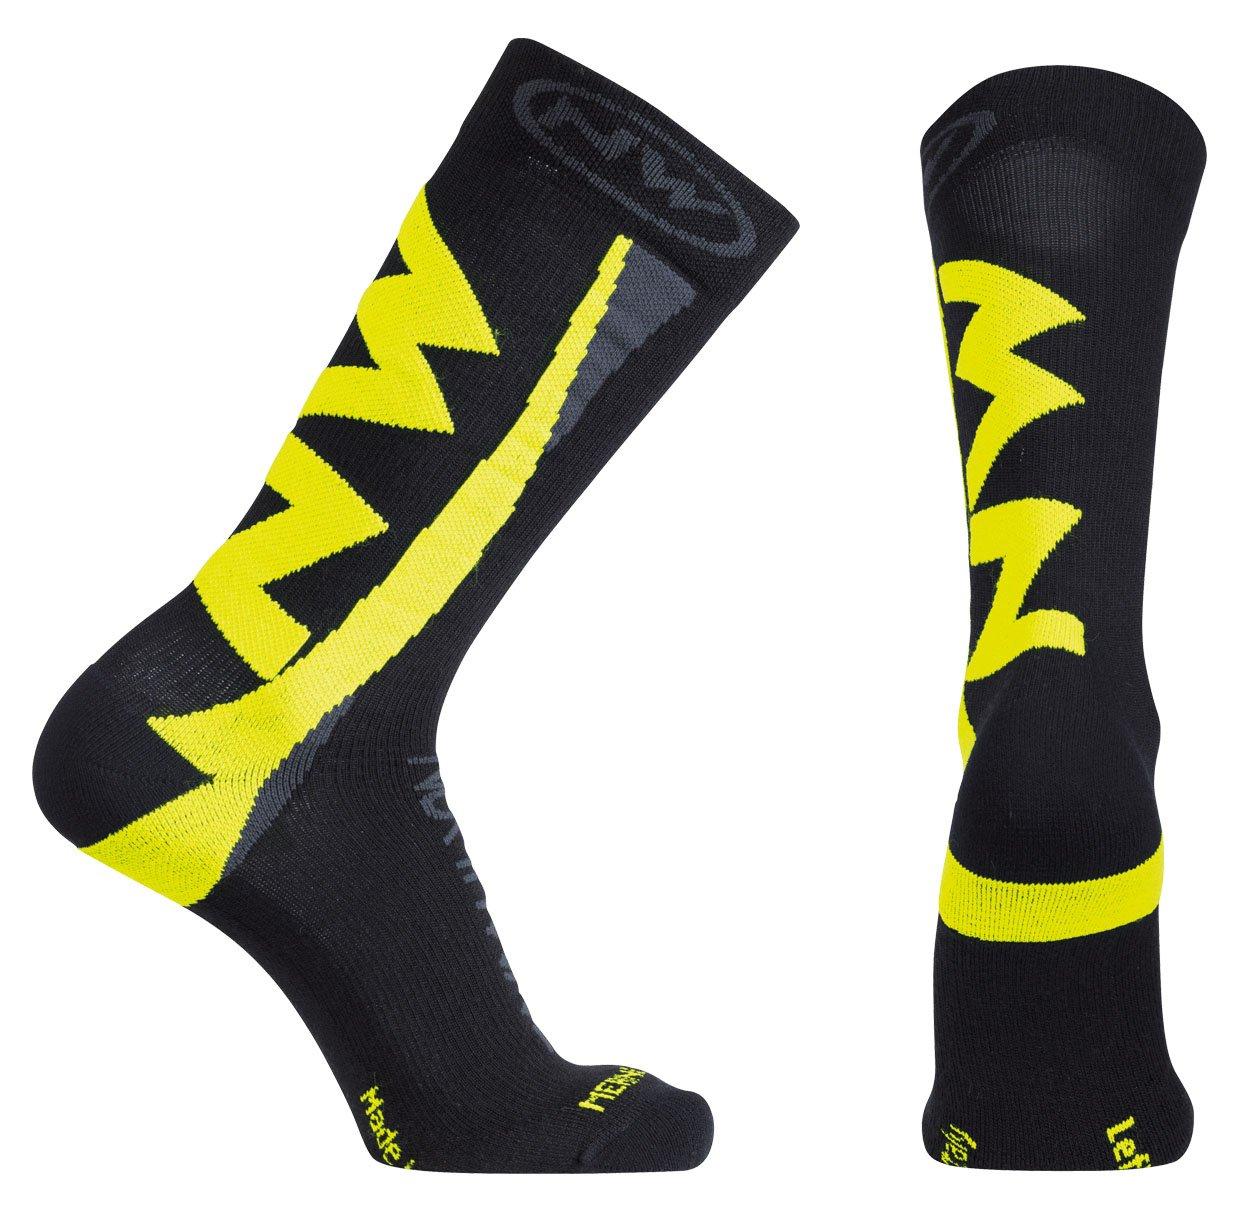 Northwave Extreme Winter High Socks - Black/Fluorescent Yellow - L